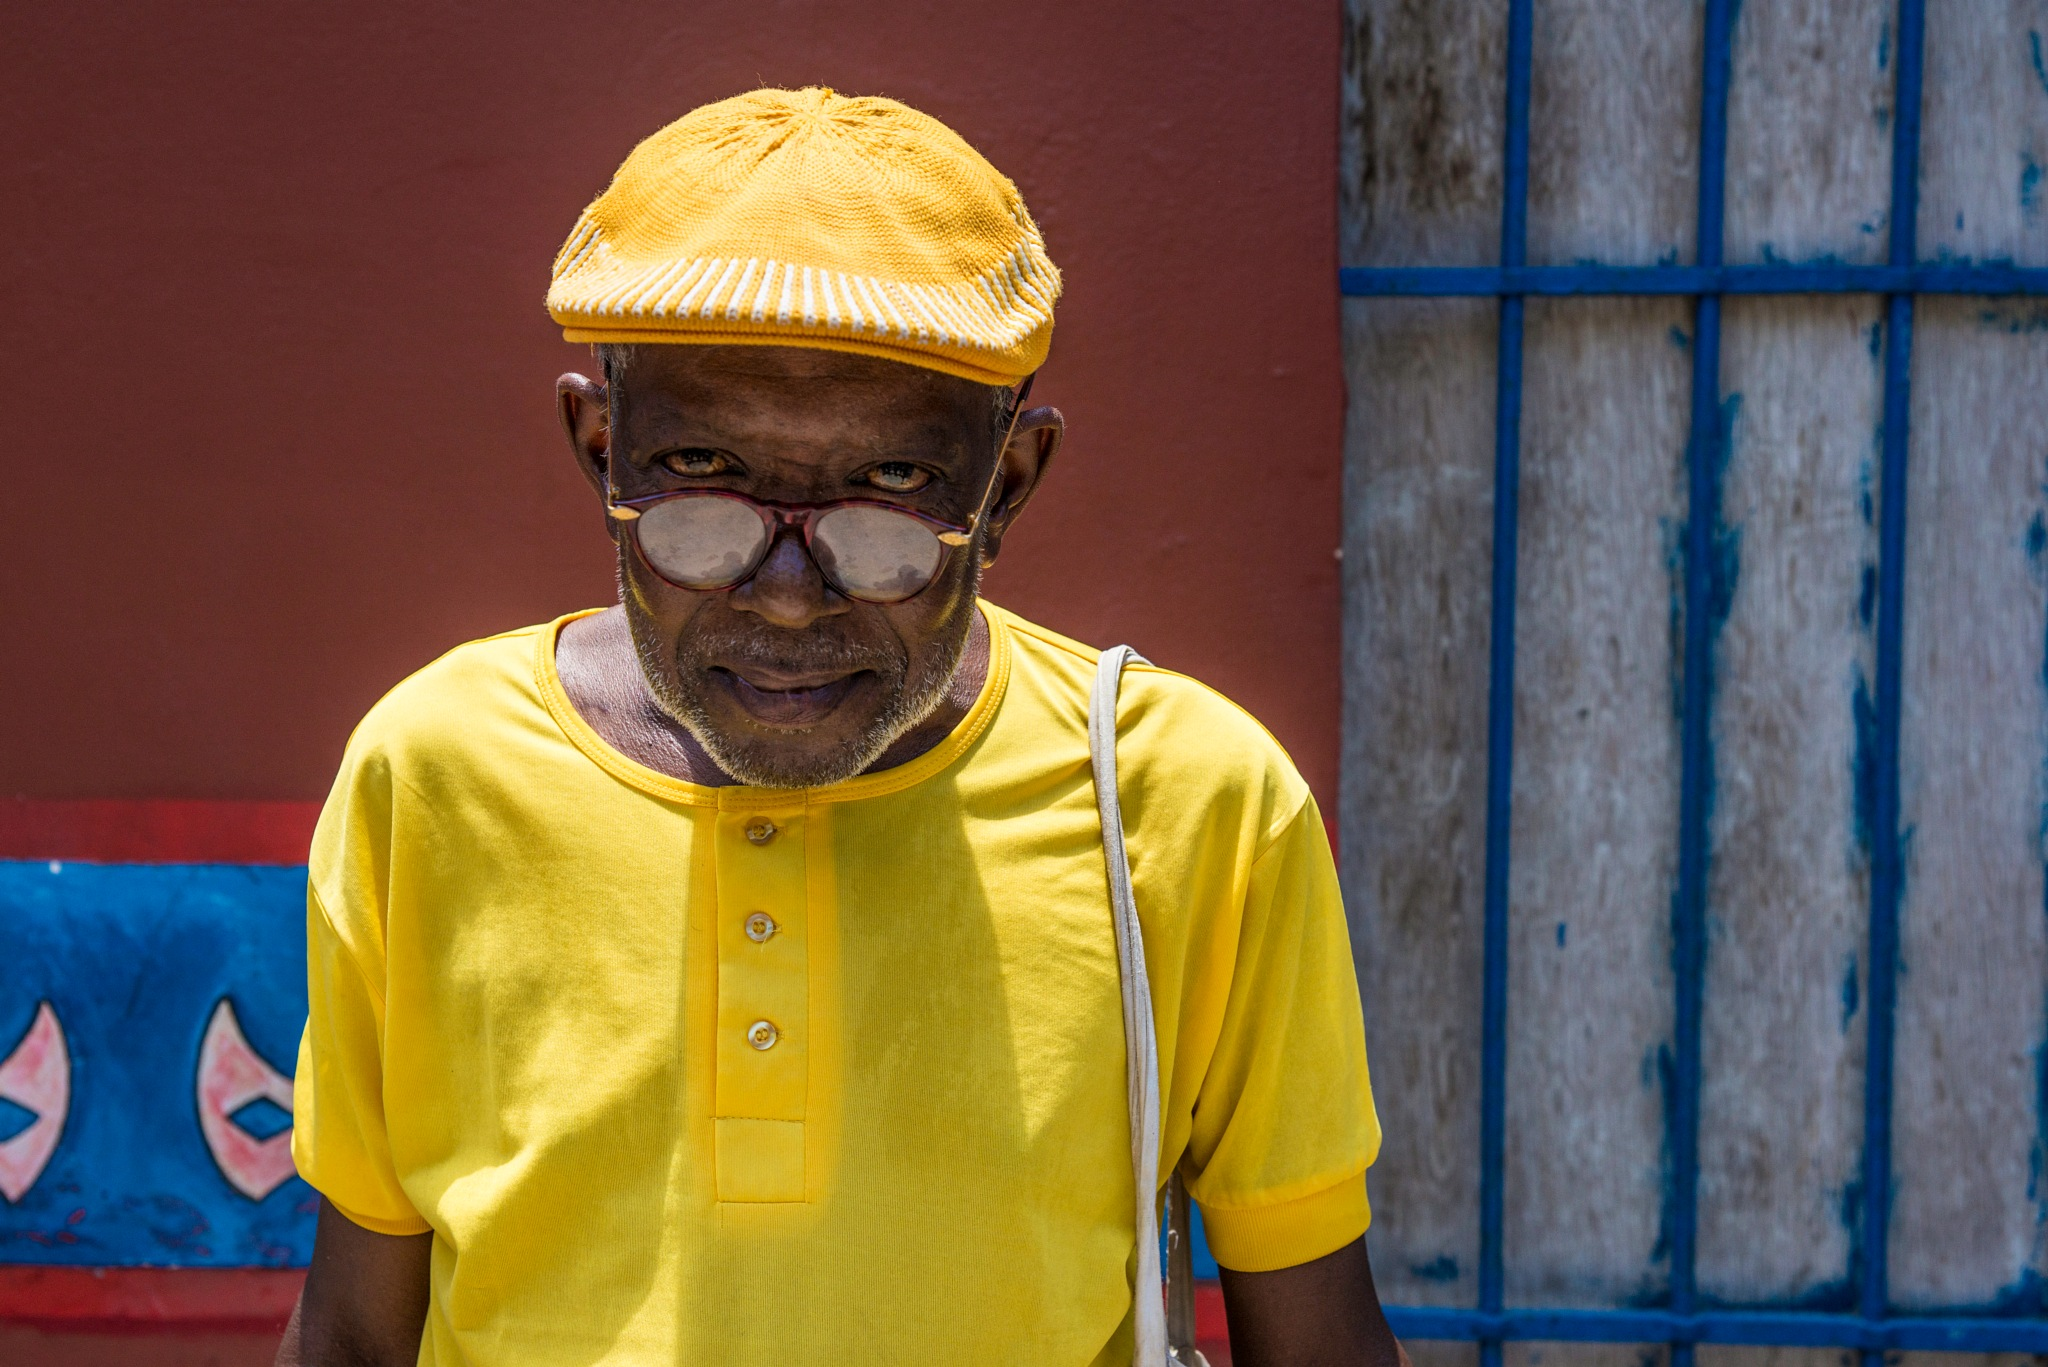 Yellow man by Alessandro Longo